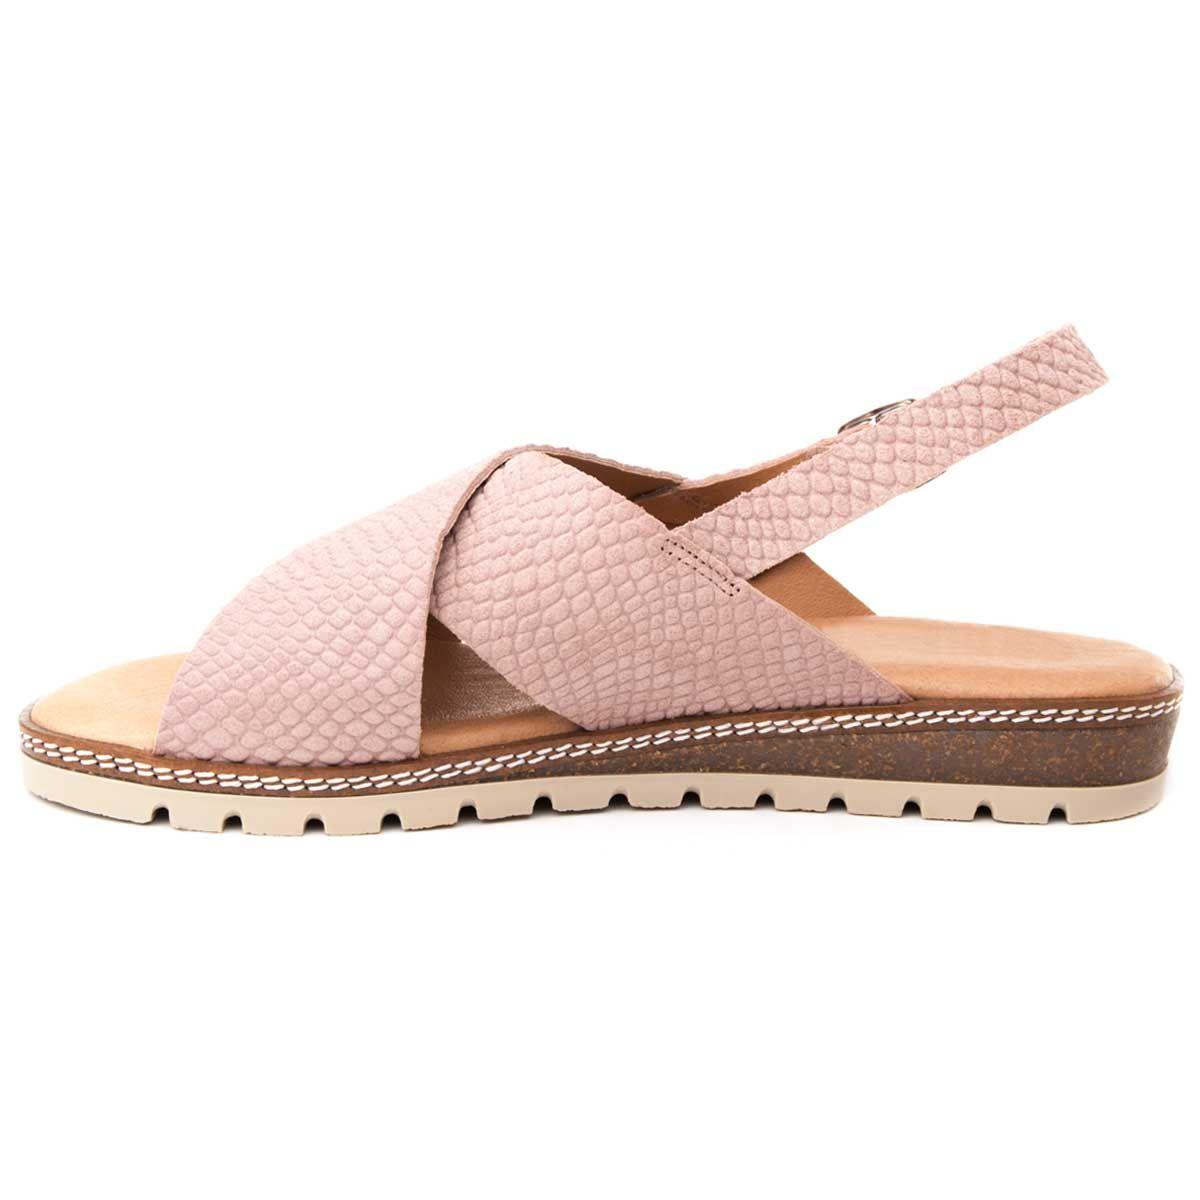 Purapiel Flat Wedge Sandal in Nude